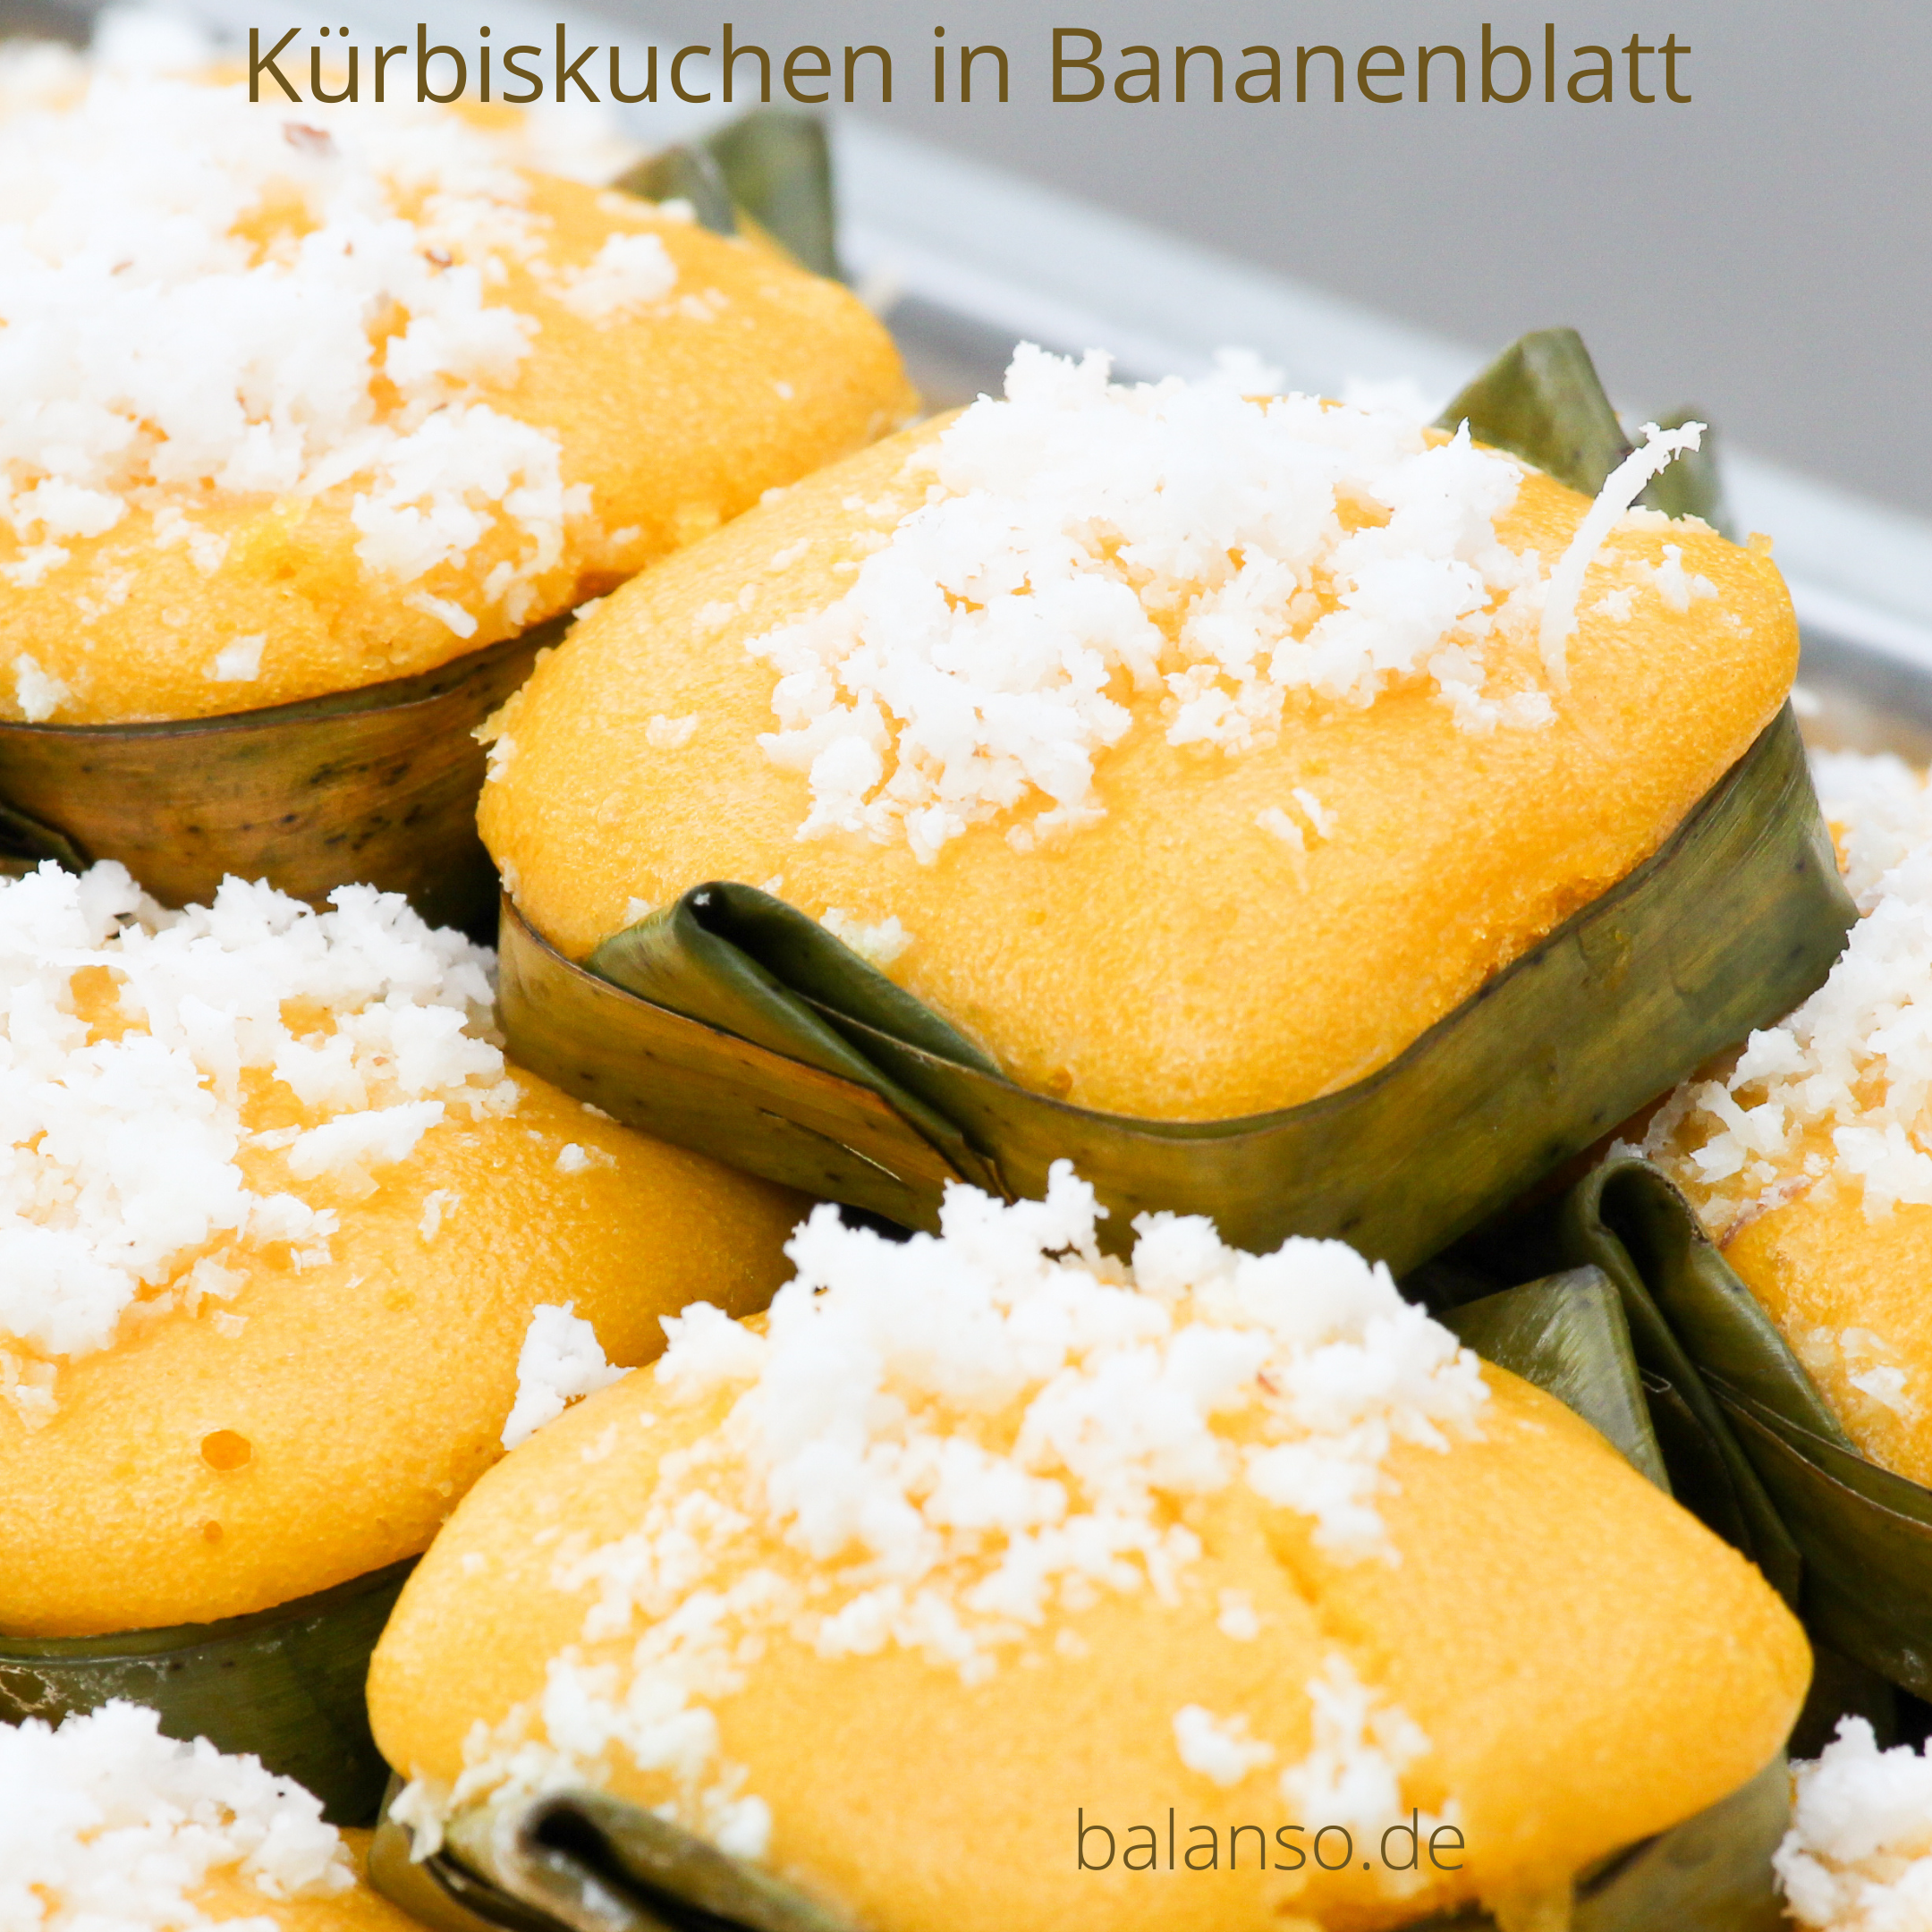 Indonesischer Kürbiskuchen in Bananenblatt